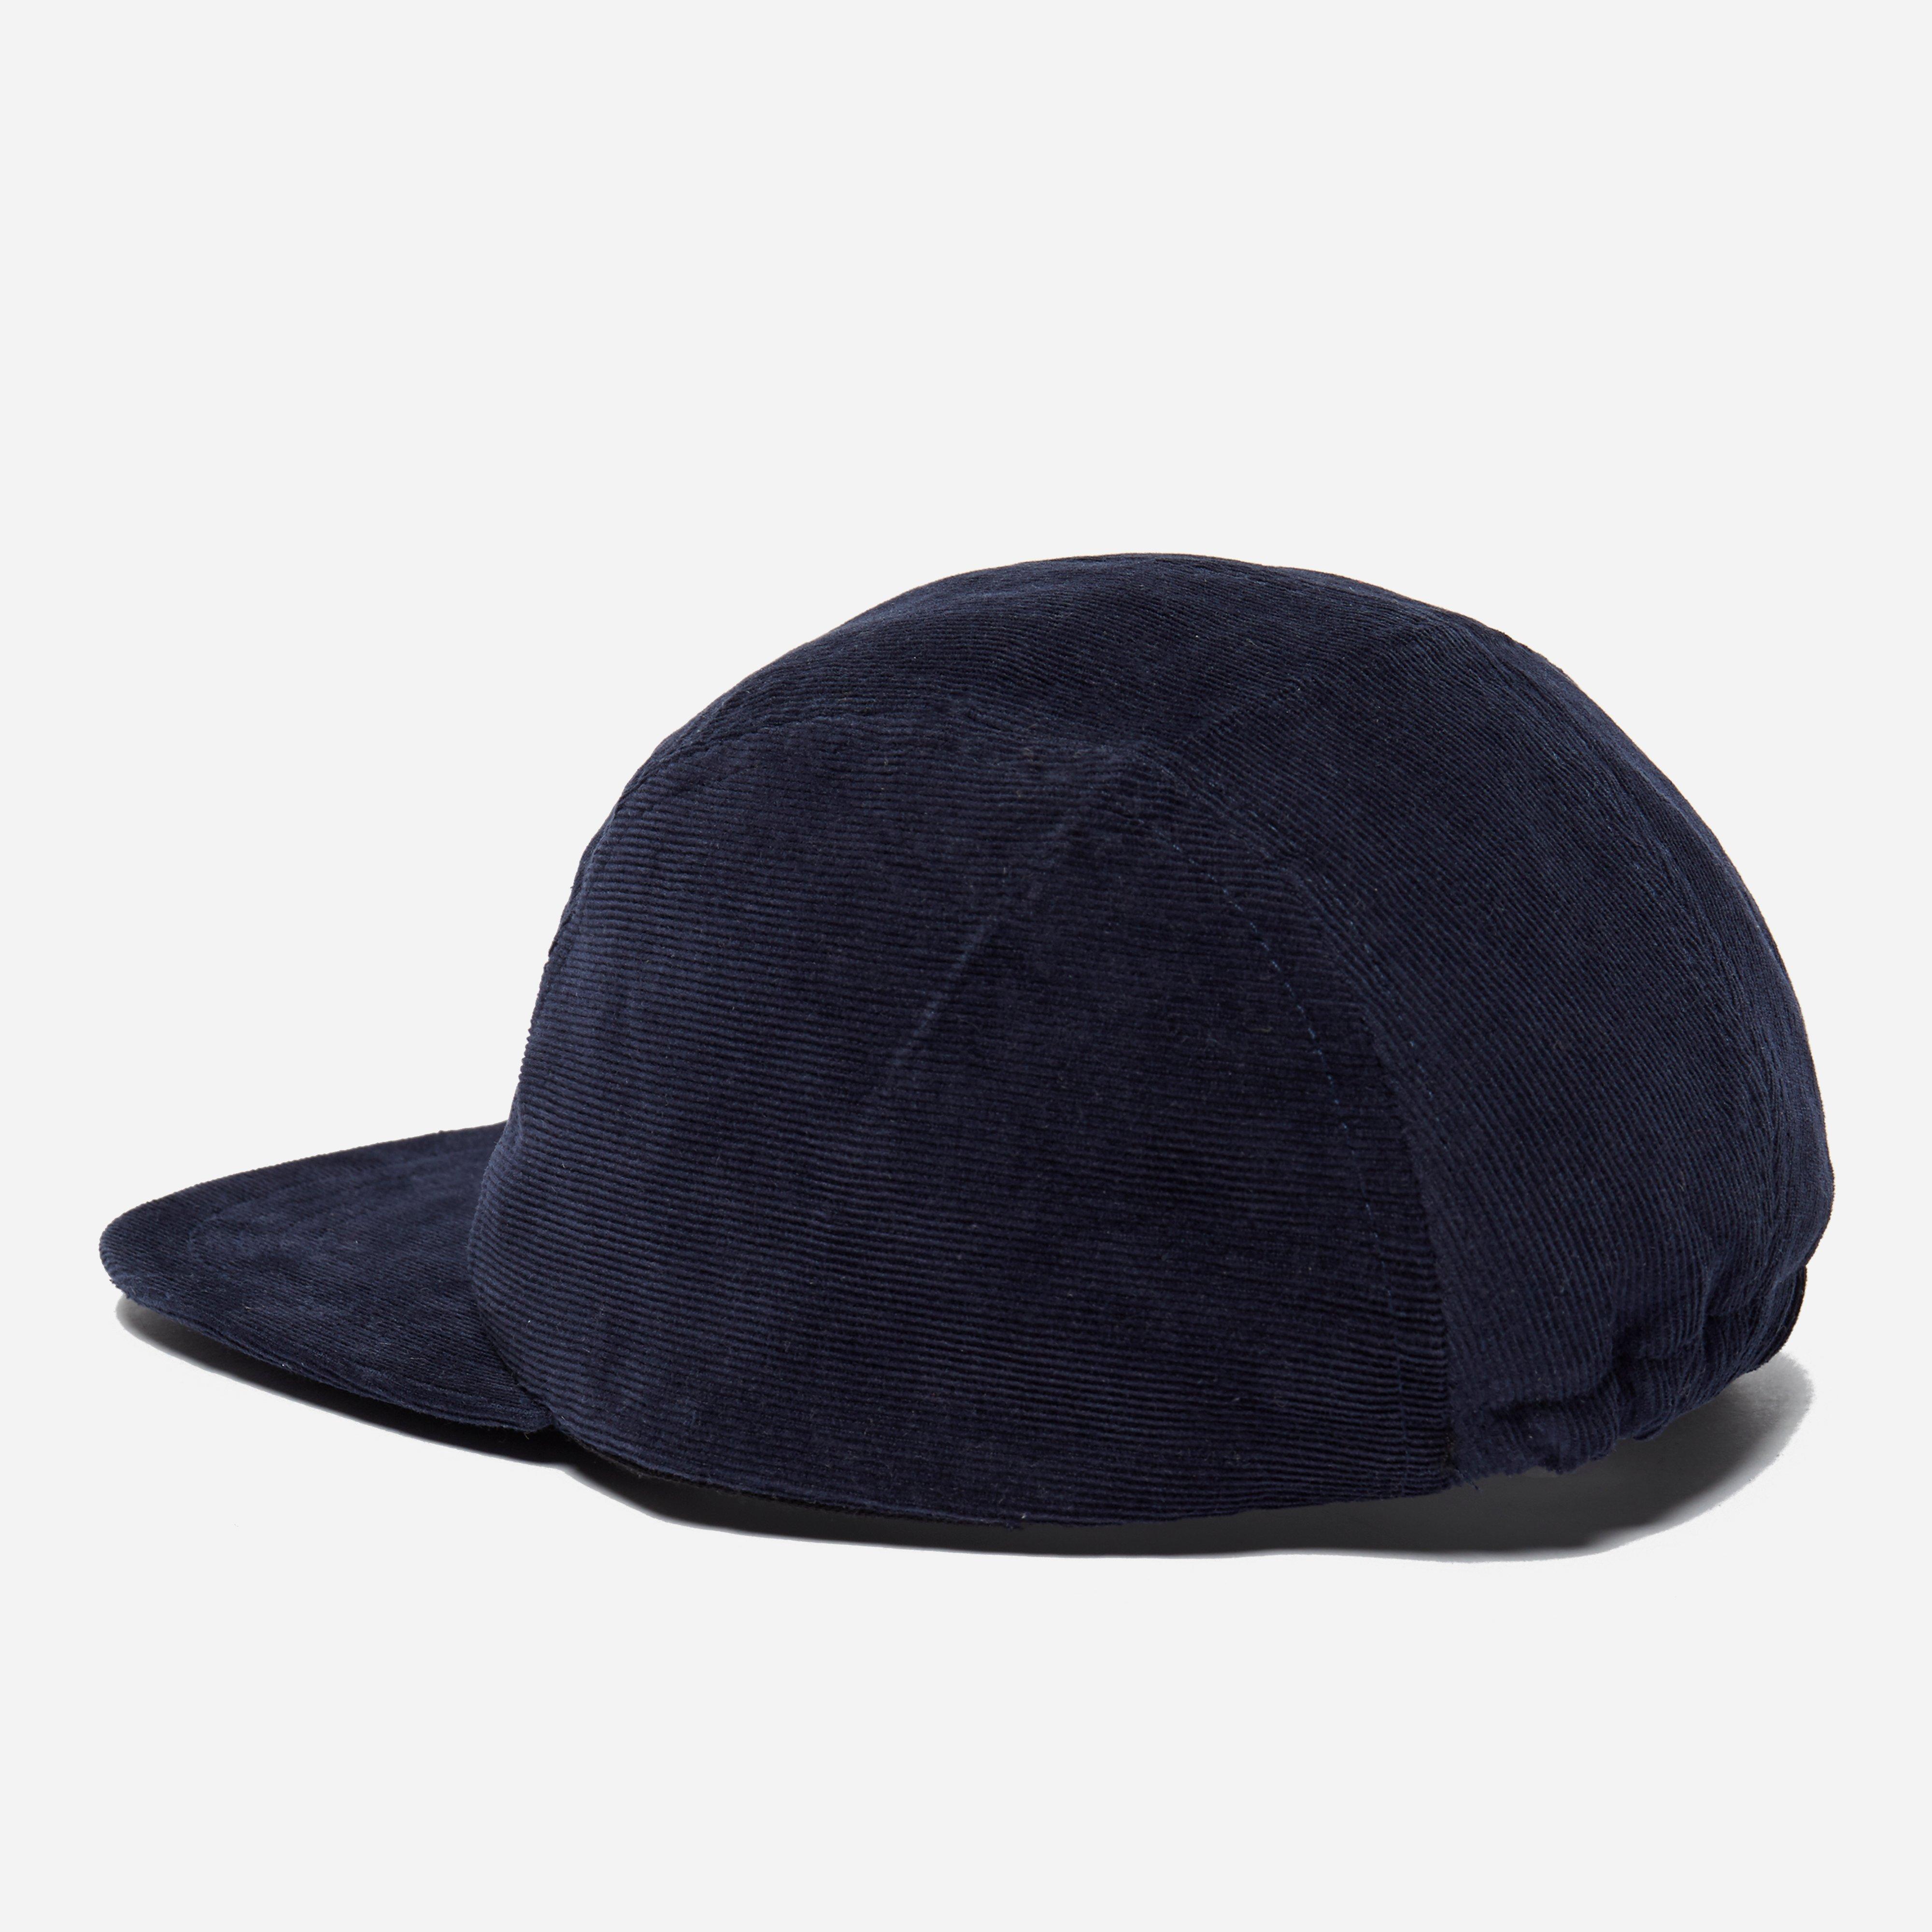 7e68c300b6c Lyst - Les Basics Le Peak Corduroy Cap in Blue for Men